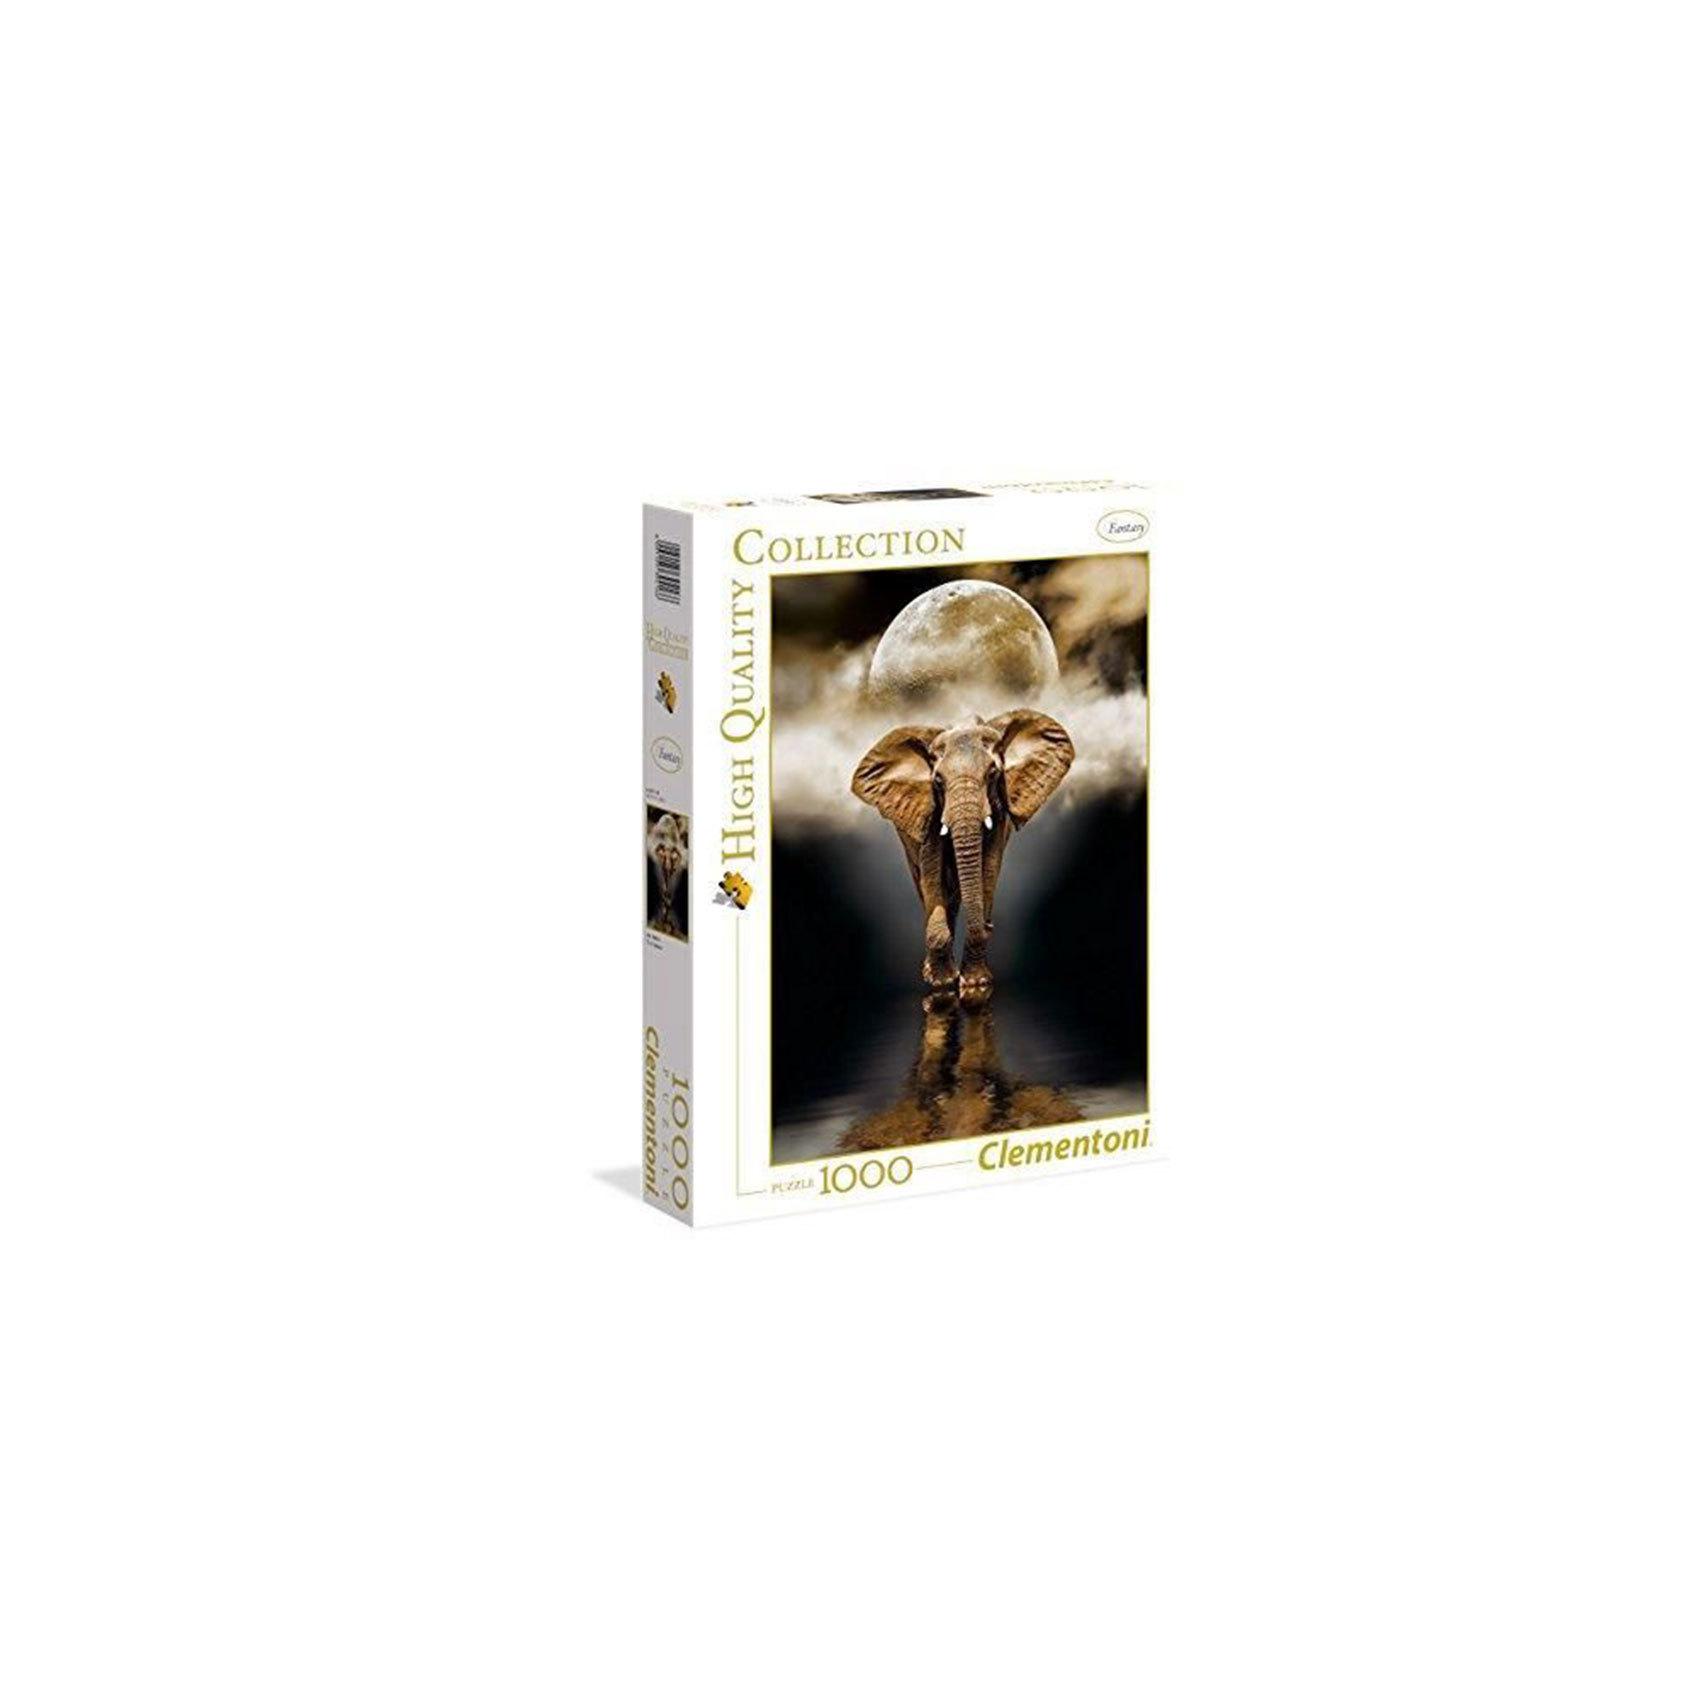 CLEMENTONI ADULT ELEPHANT 1000 PC